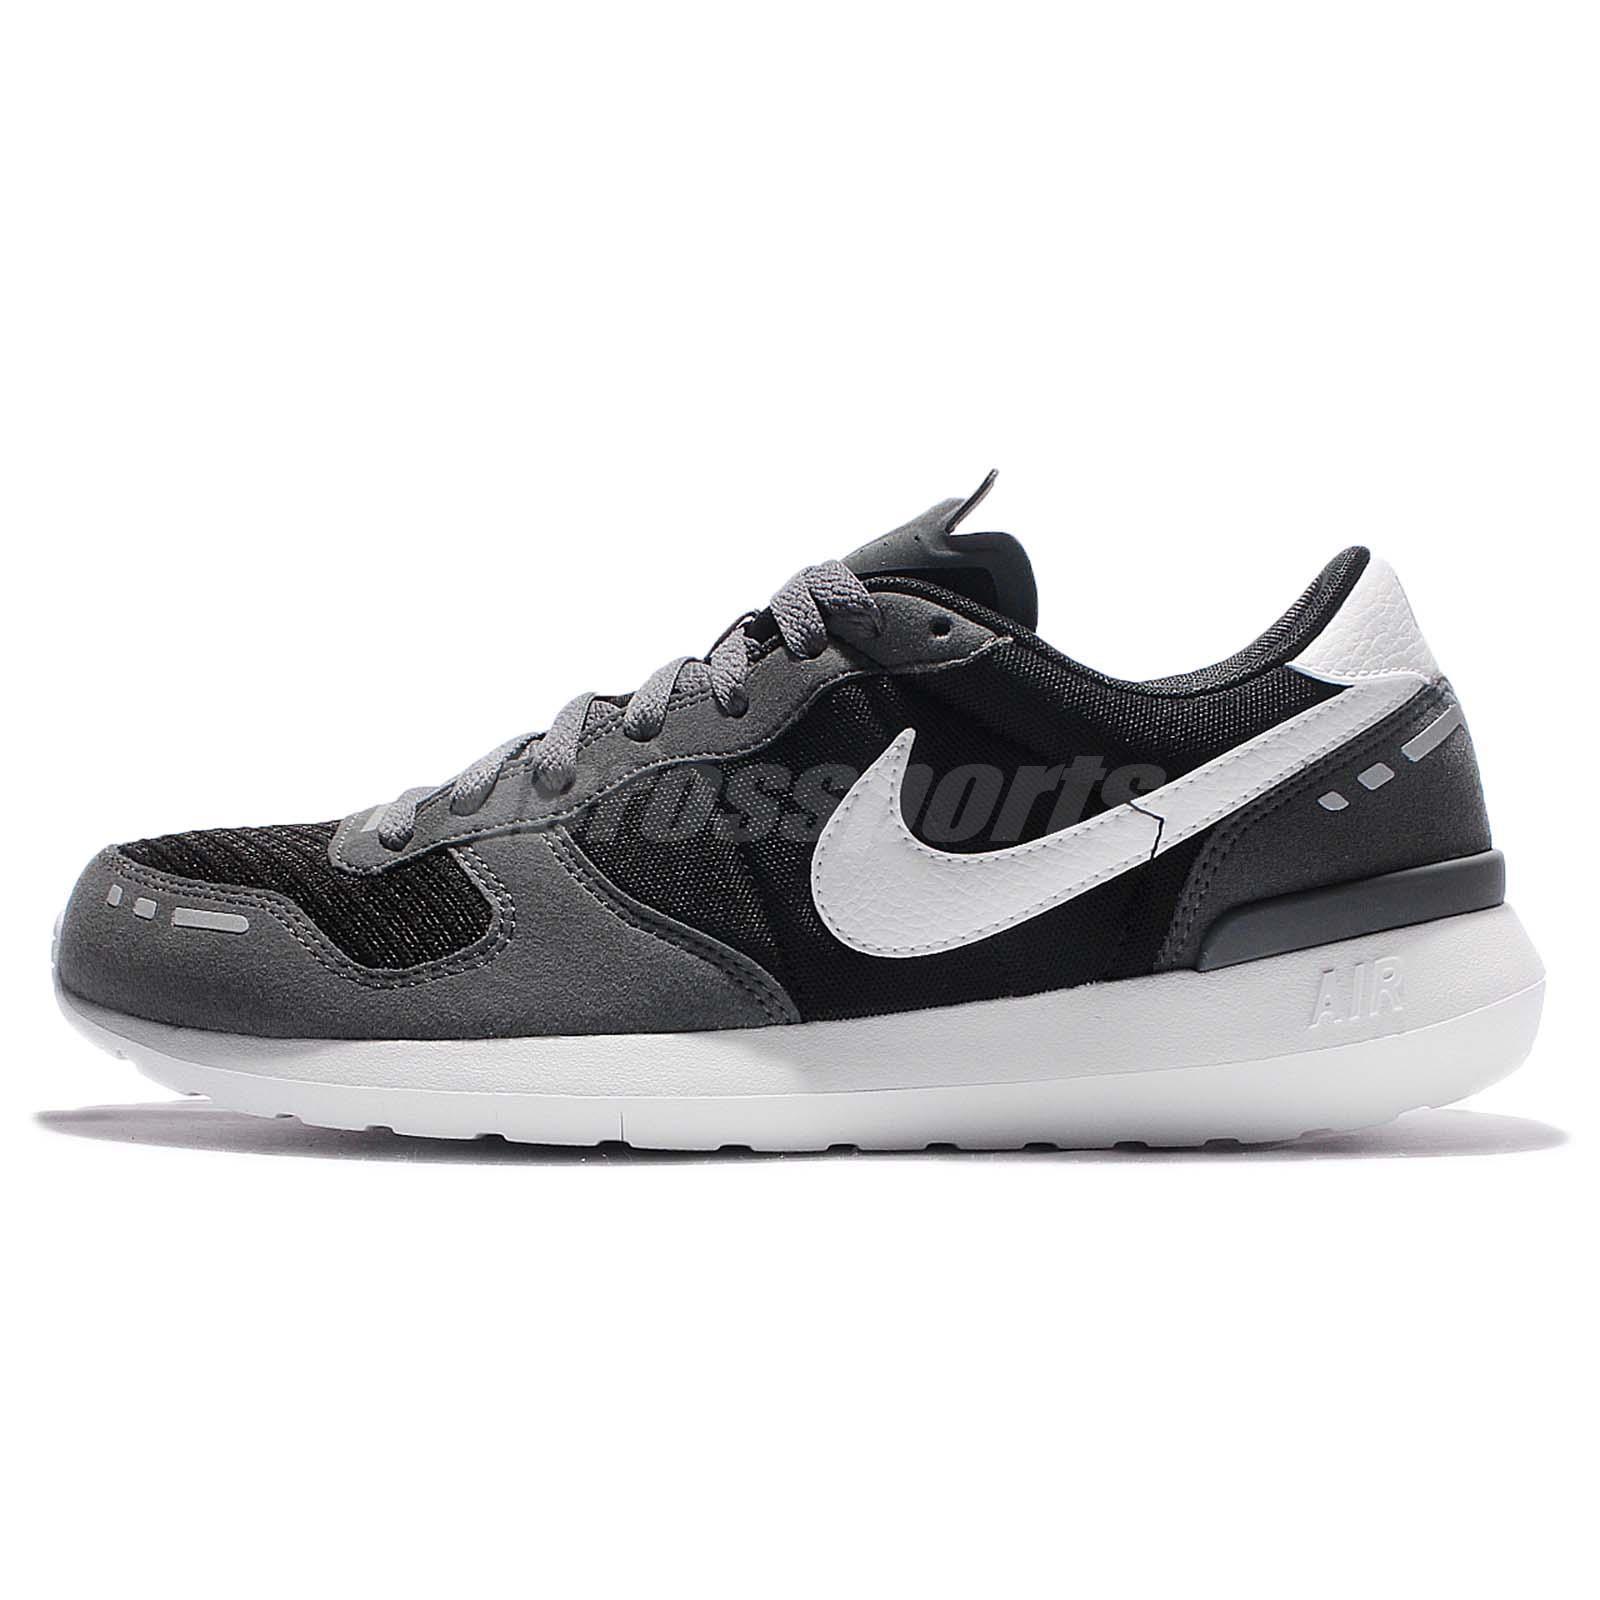 save off f382b 741b4 Nike Air VRTX 17 Vortex Grey White Black Men Running Shoes Sneakers  876135-001